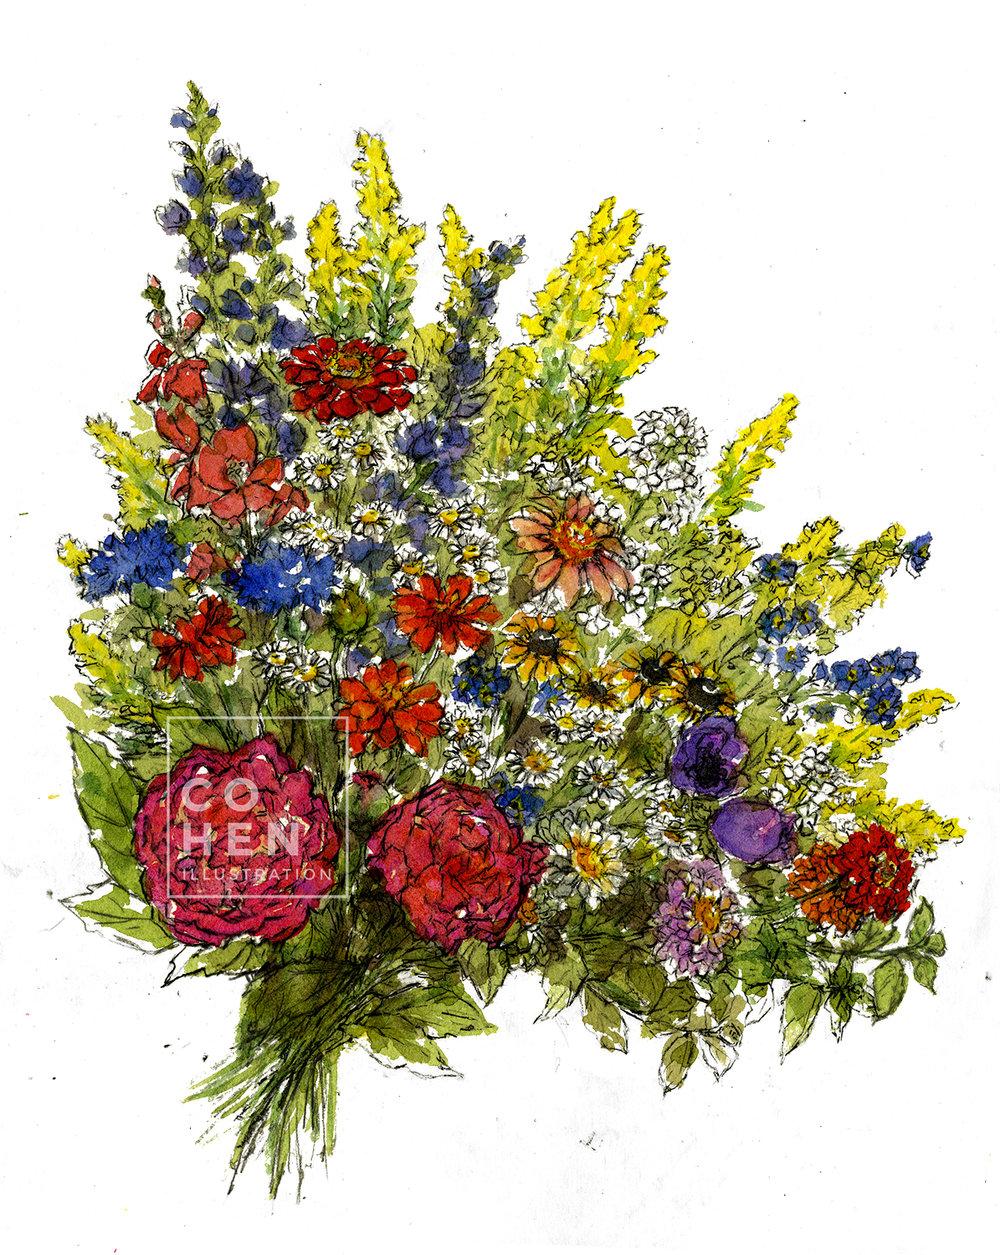 Wildflowers-cohenillustration.jpg